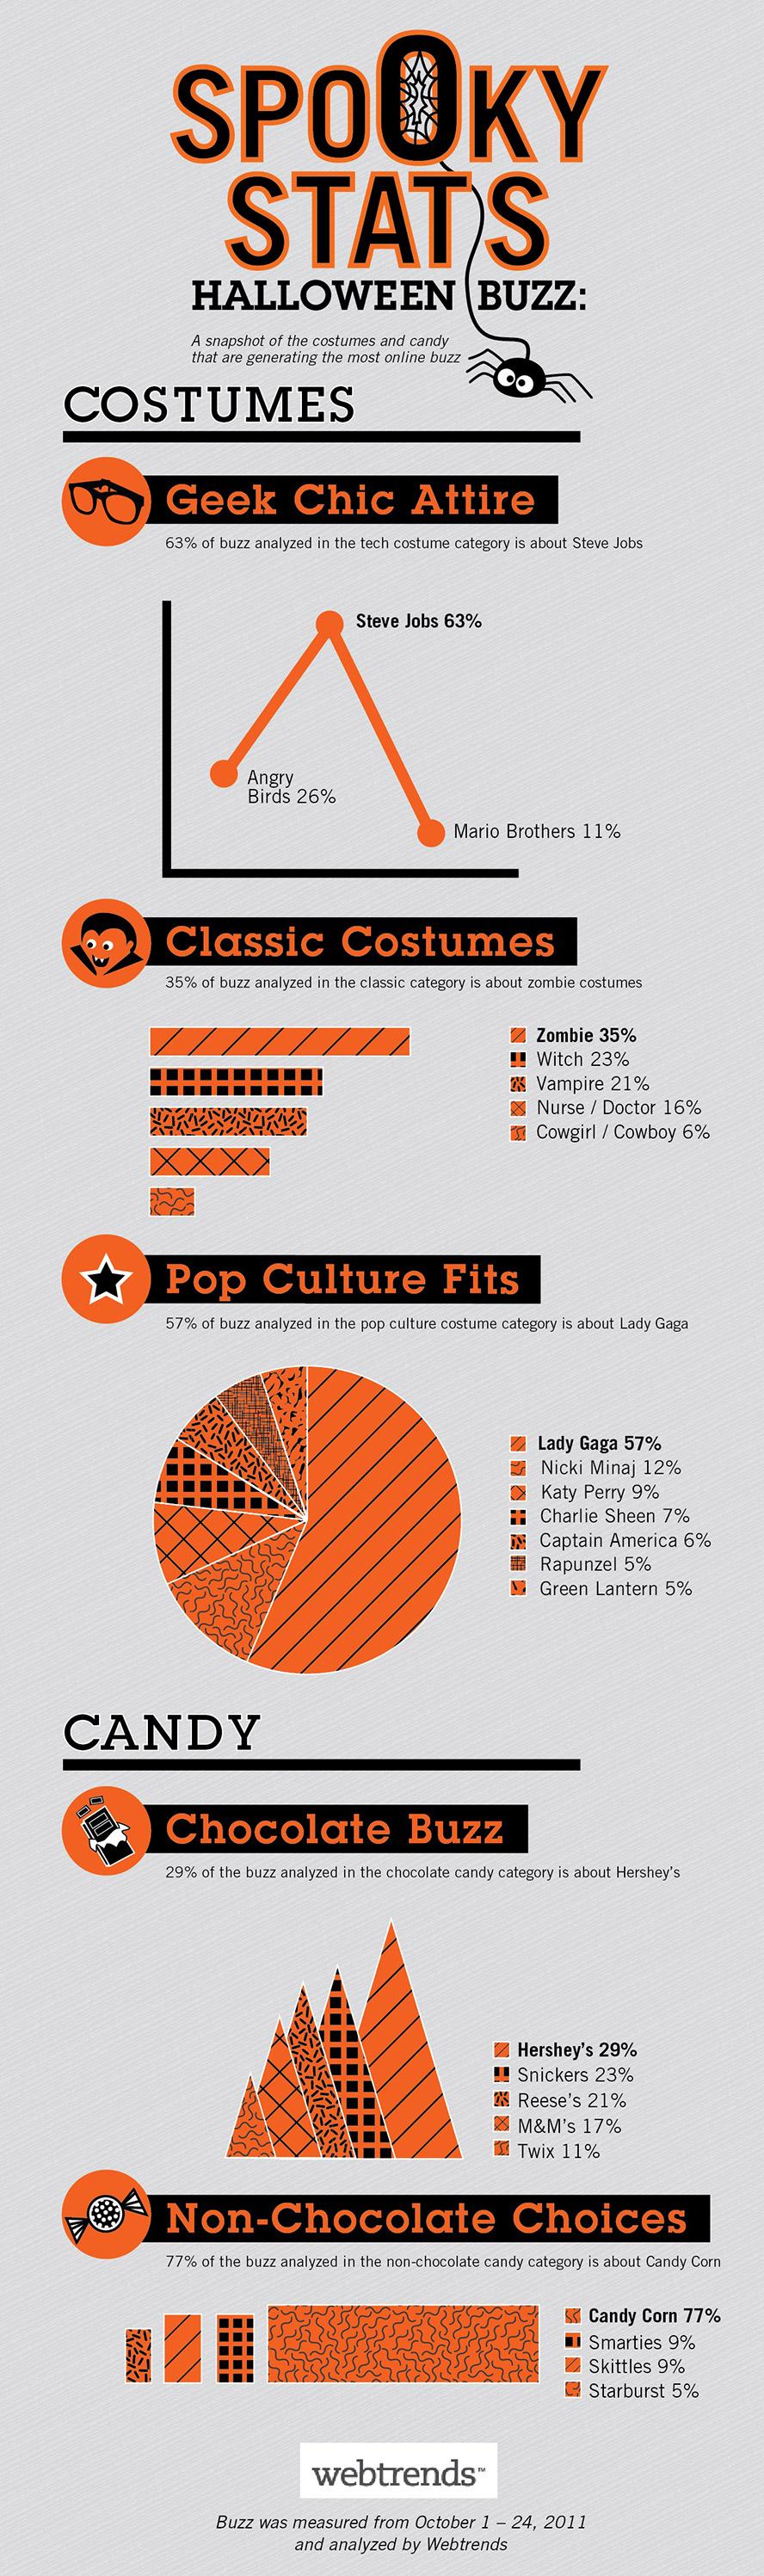 Disfraces mas populares de halloween 2011